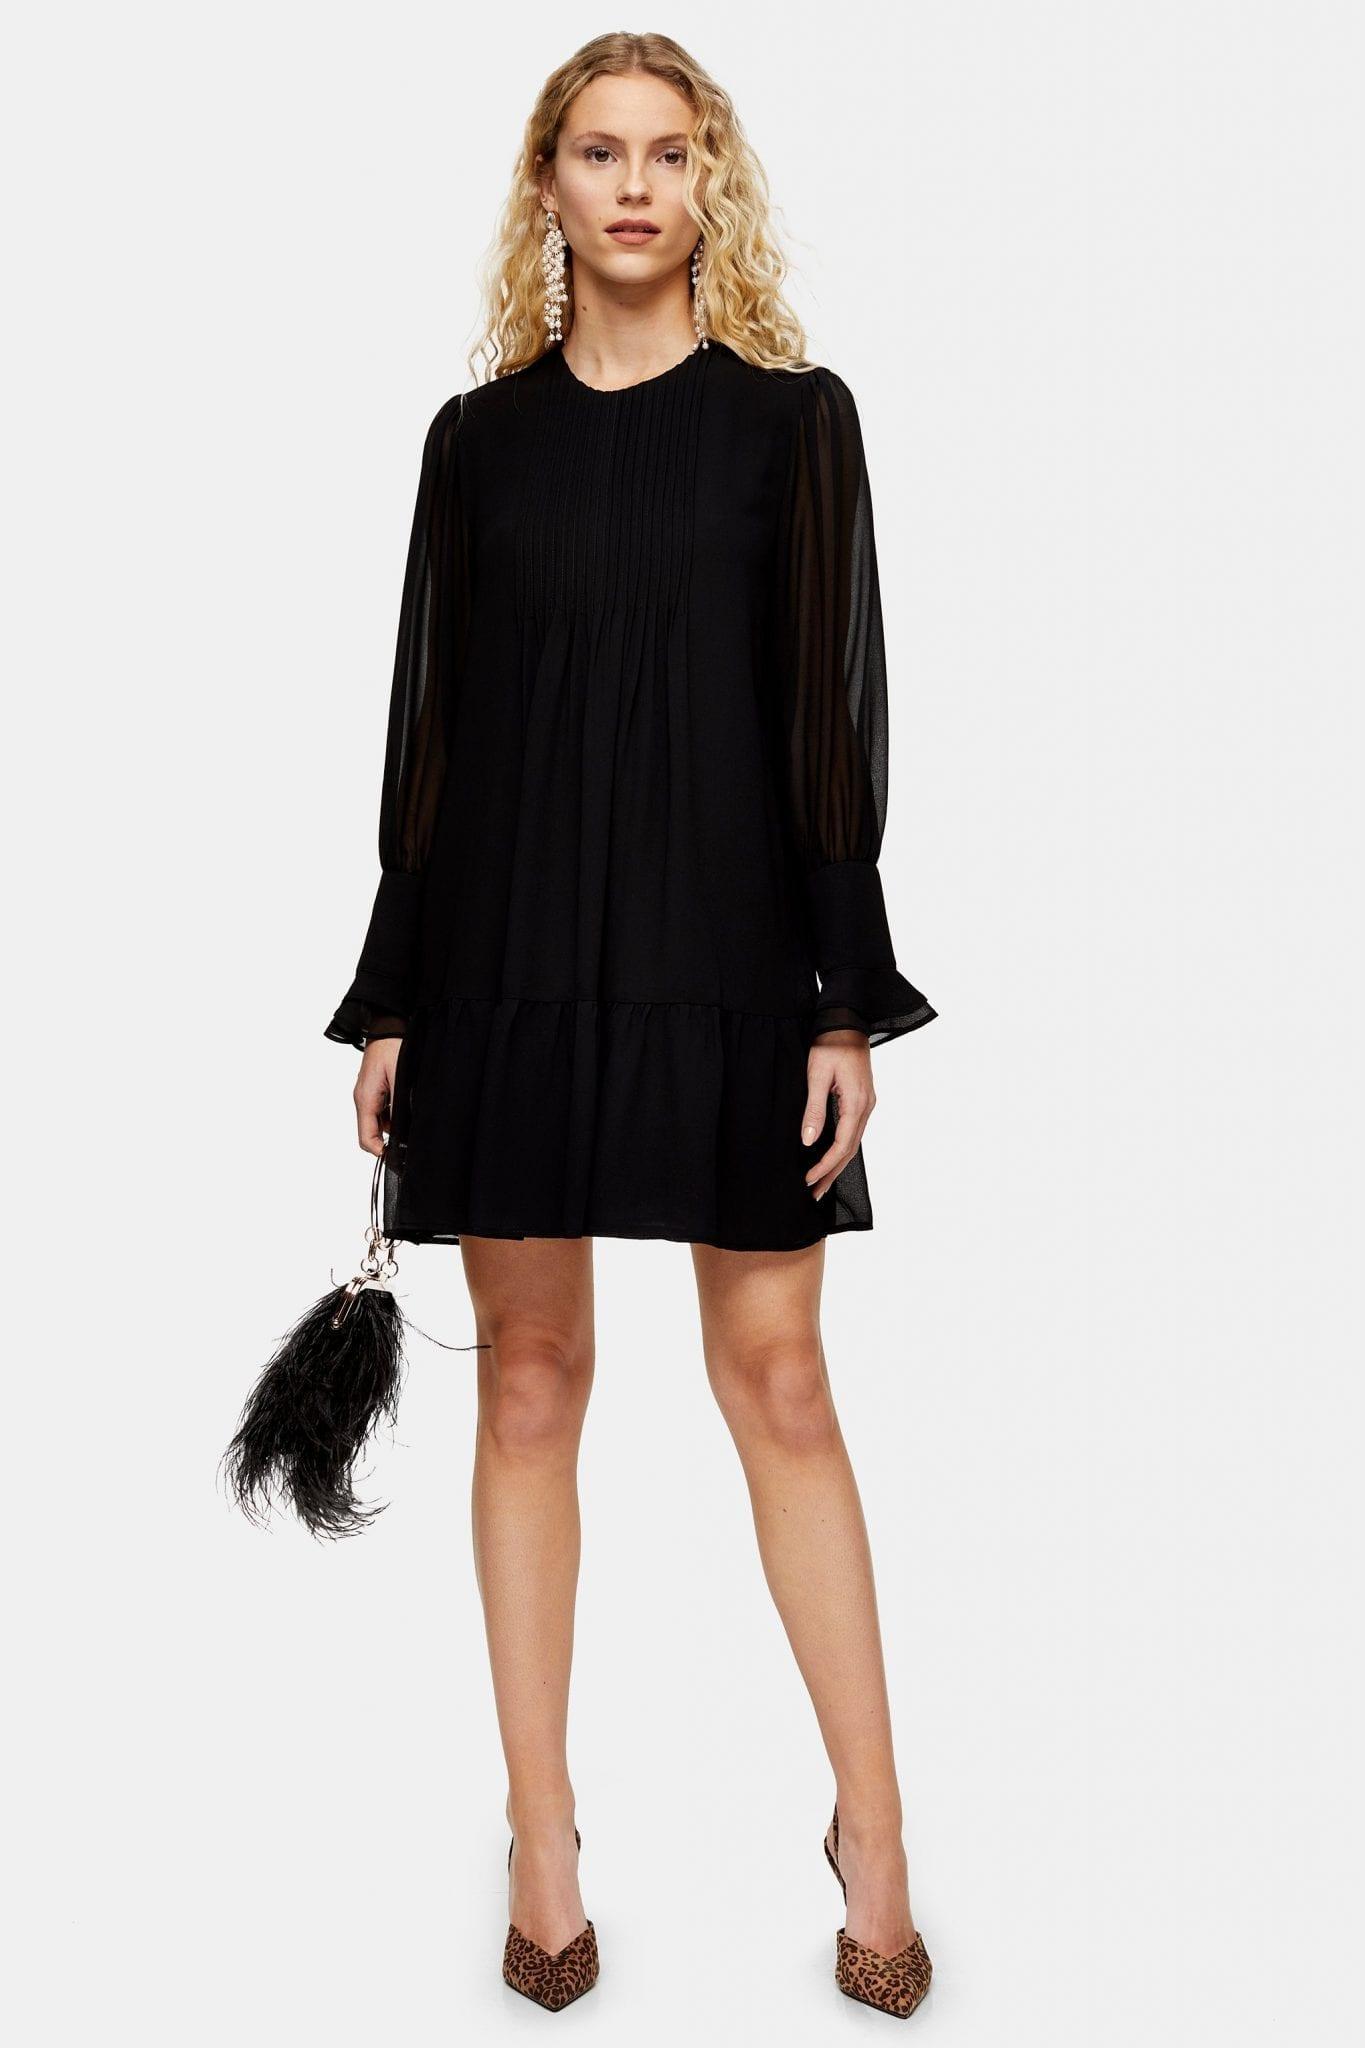 TOPSHOP Black Pintuck Mini Dress